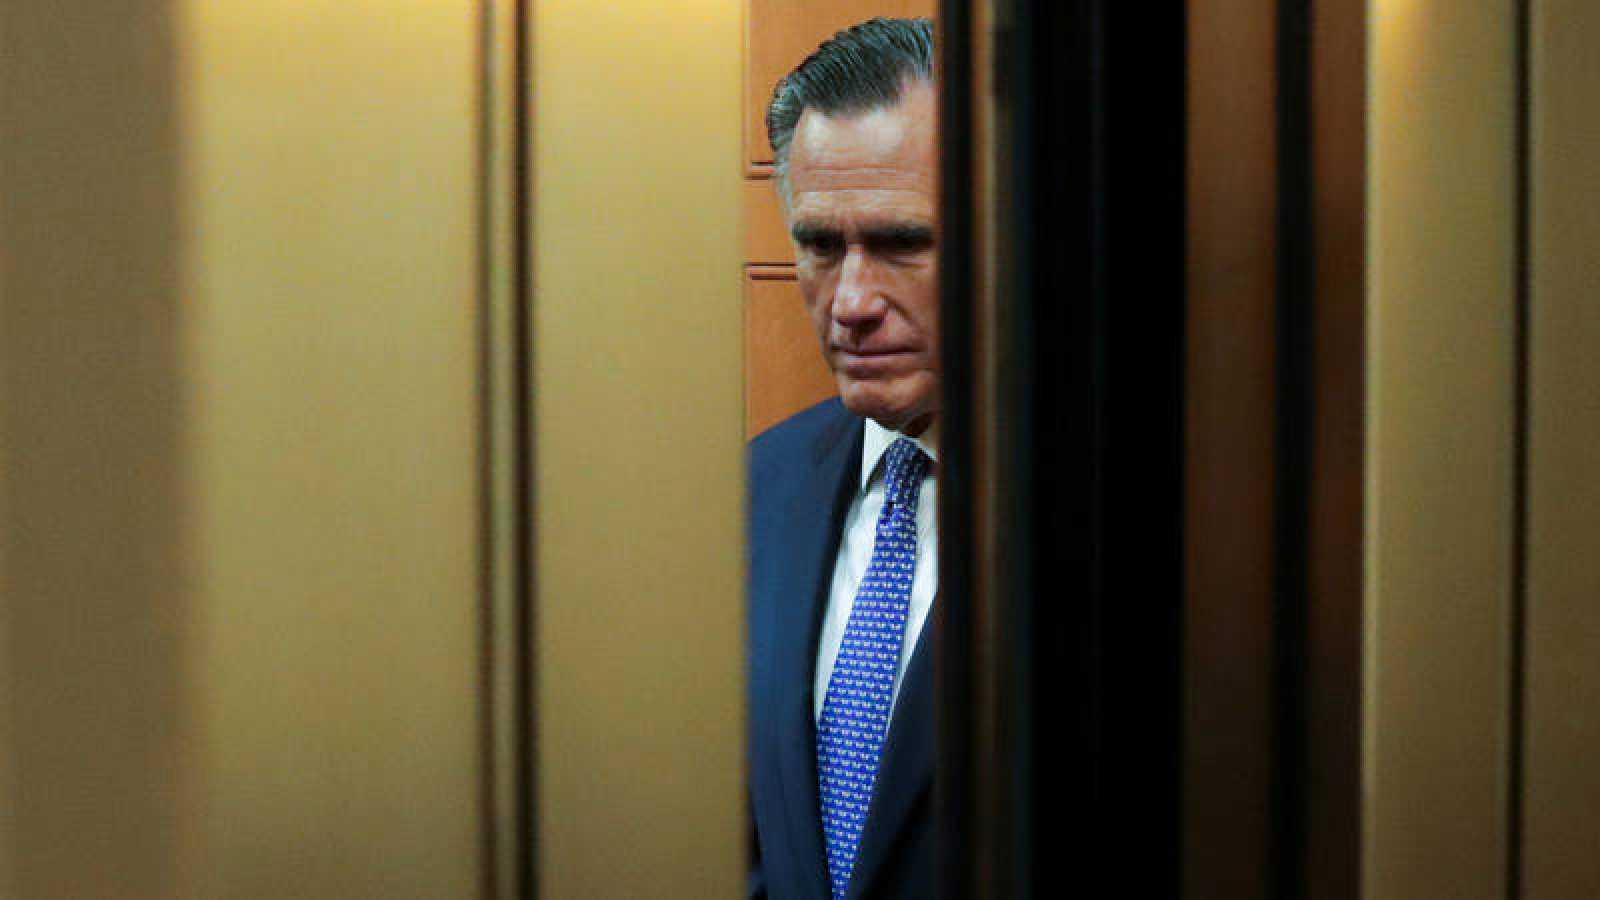 El senador republicano Mitt Romney votó a favor de destituir a Donald Trump, de su mismo partido